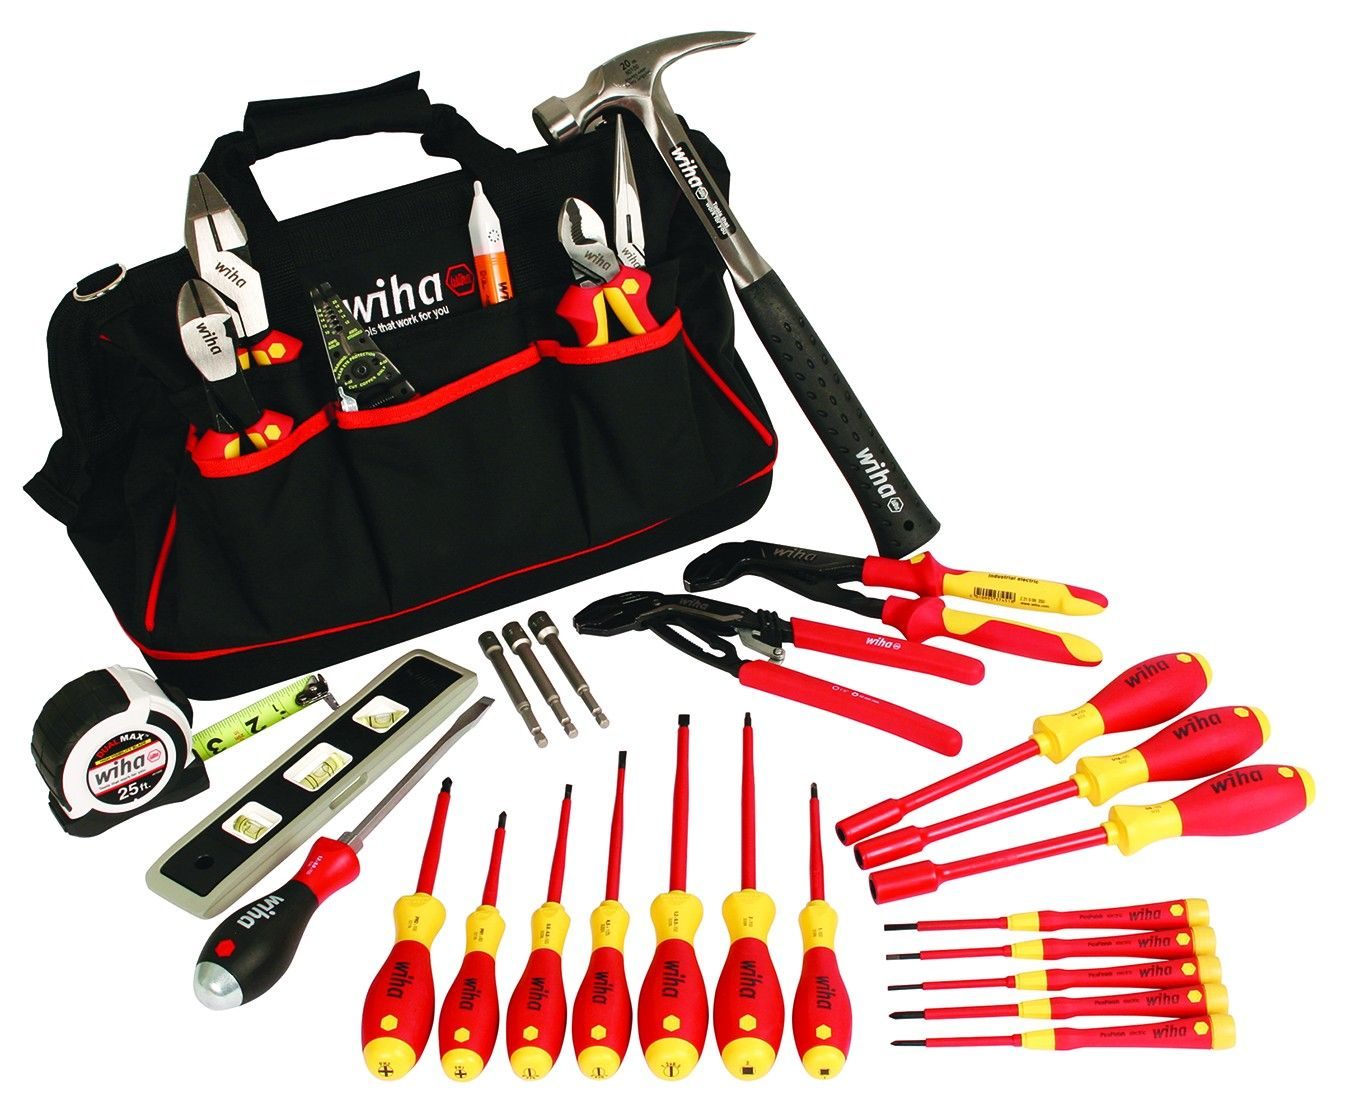 Journeyman S Tool Set 30 Piece Tool Set Tools Canvas Tool Bag